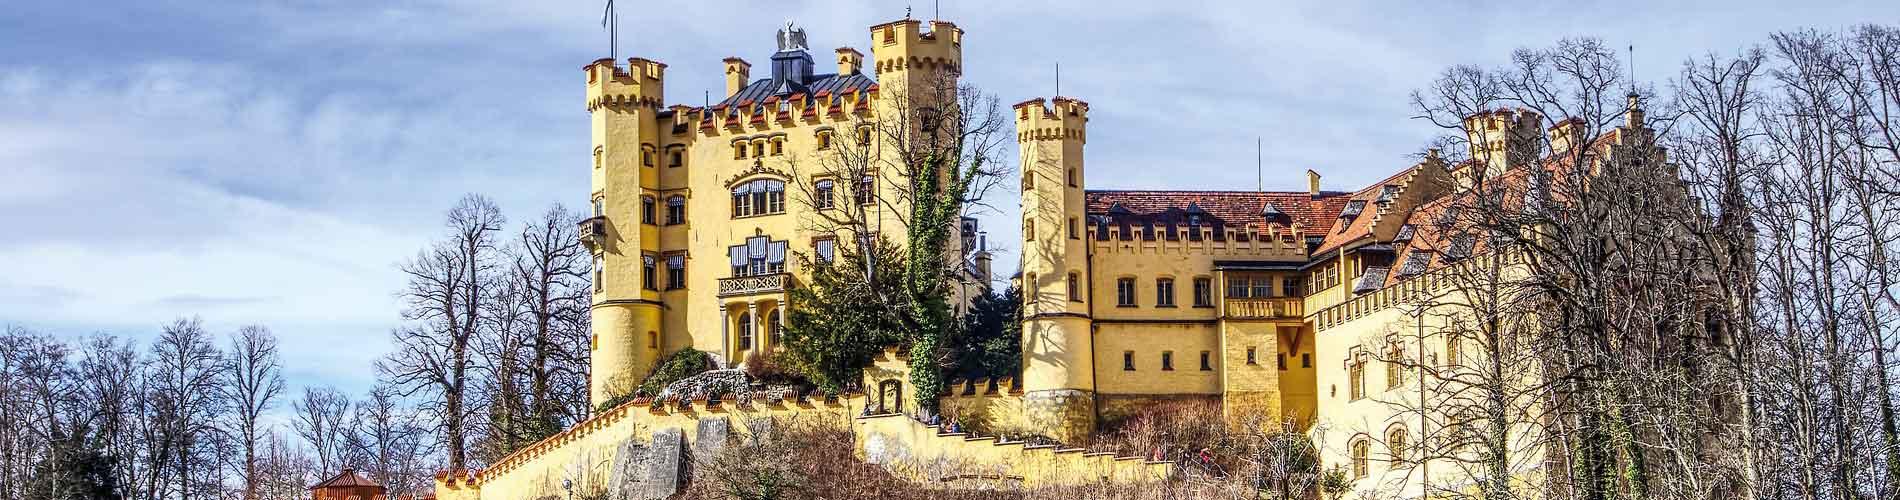 Blog_TopCastlesGermany_Hohenschwangau-Castle_1900x500